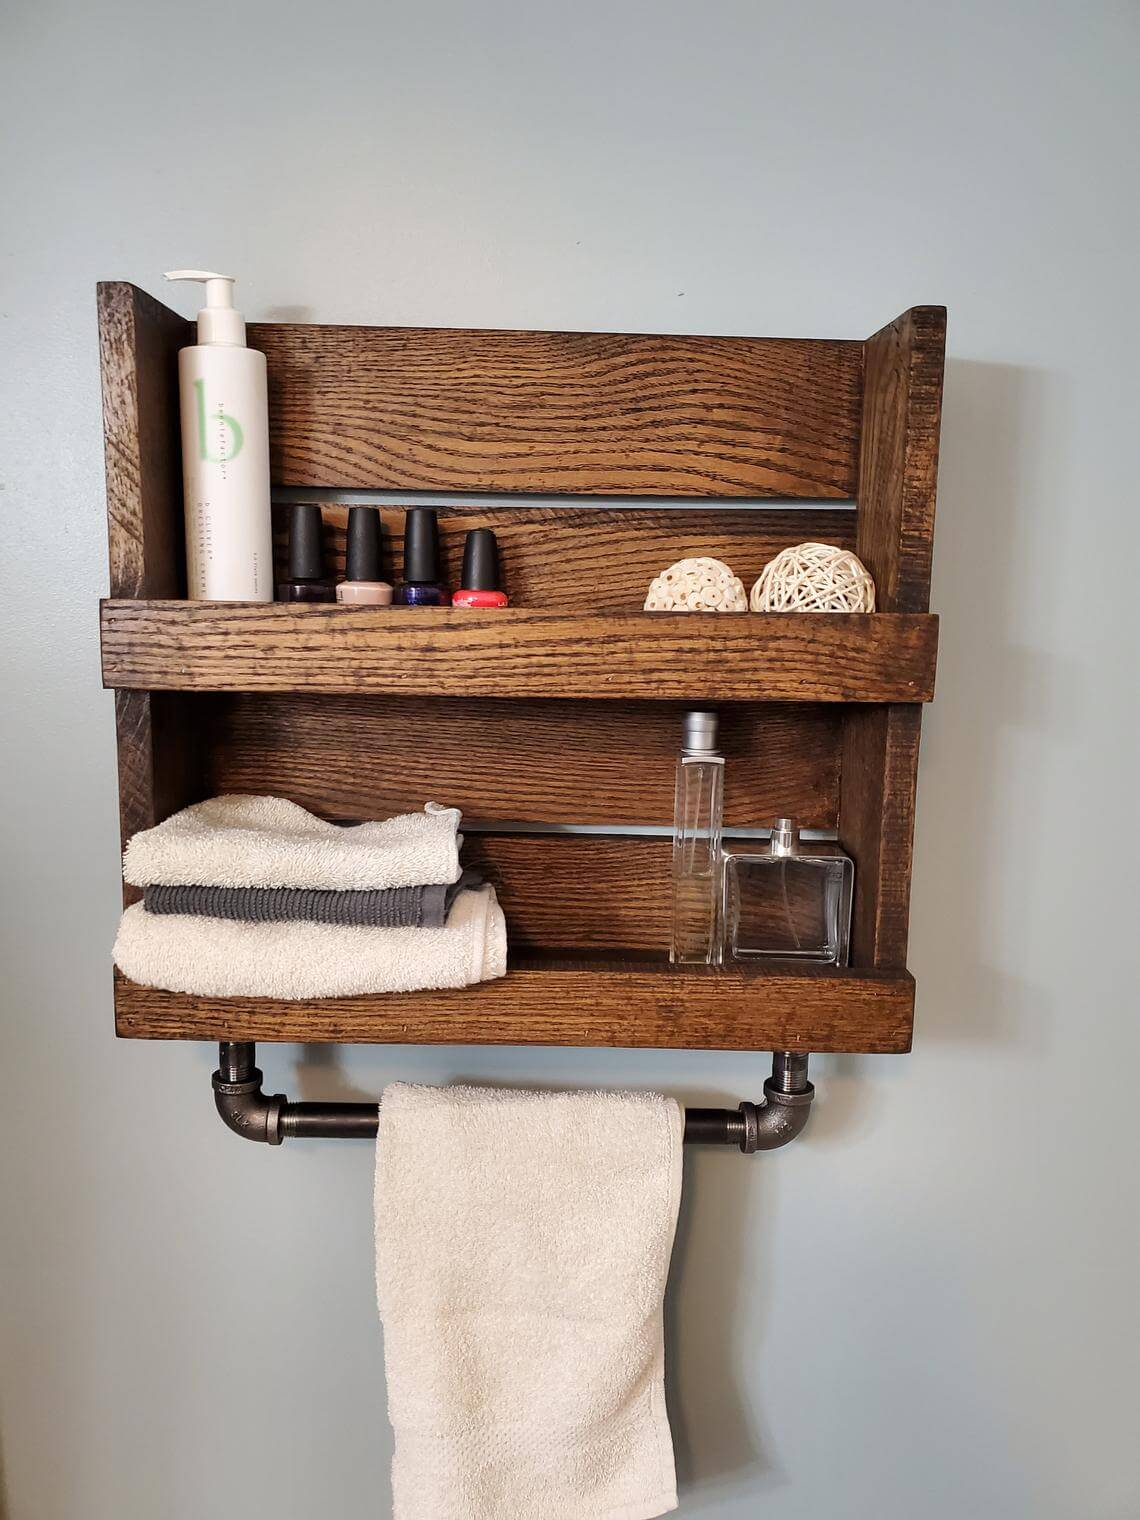 45 Best Over The Toilet Storage Ideas, Bathroom Shelves With Towel Bar Ideas